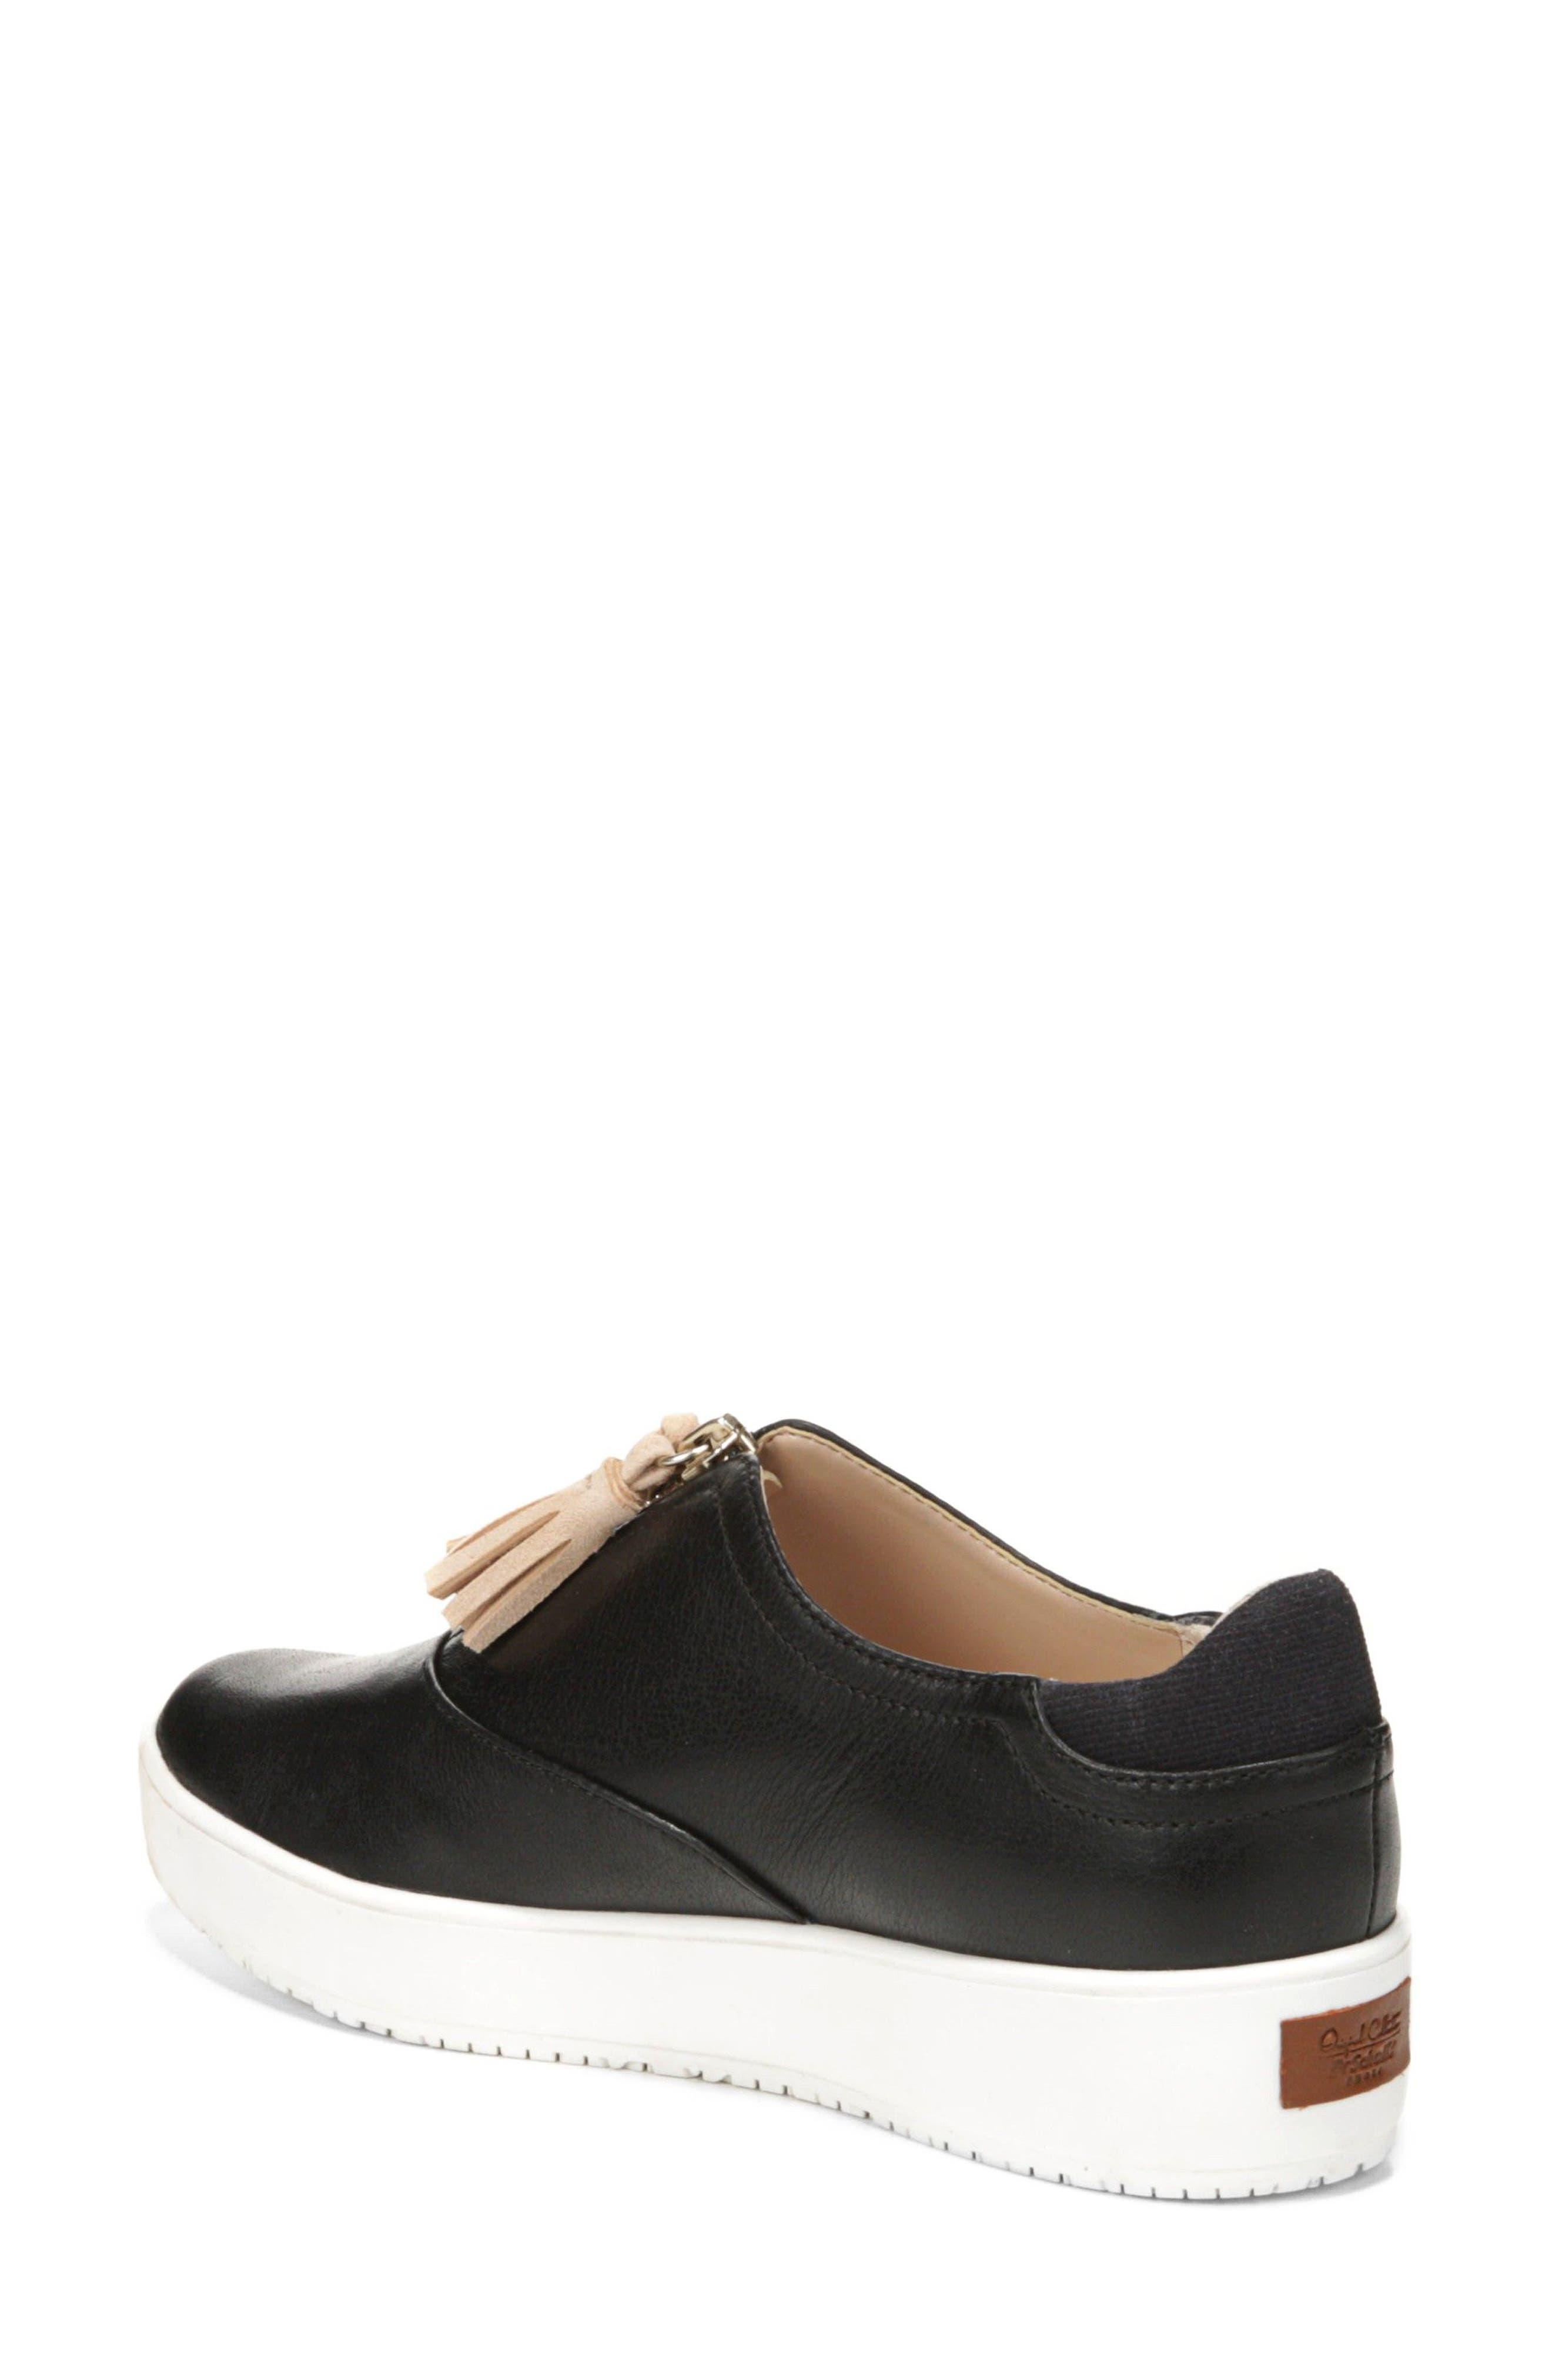 Blakely Tassel Zip Sneaker,                             Alternate thumbnail 2, color,                             001